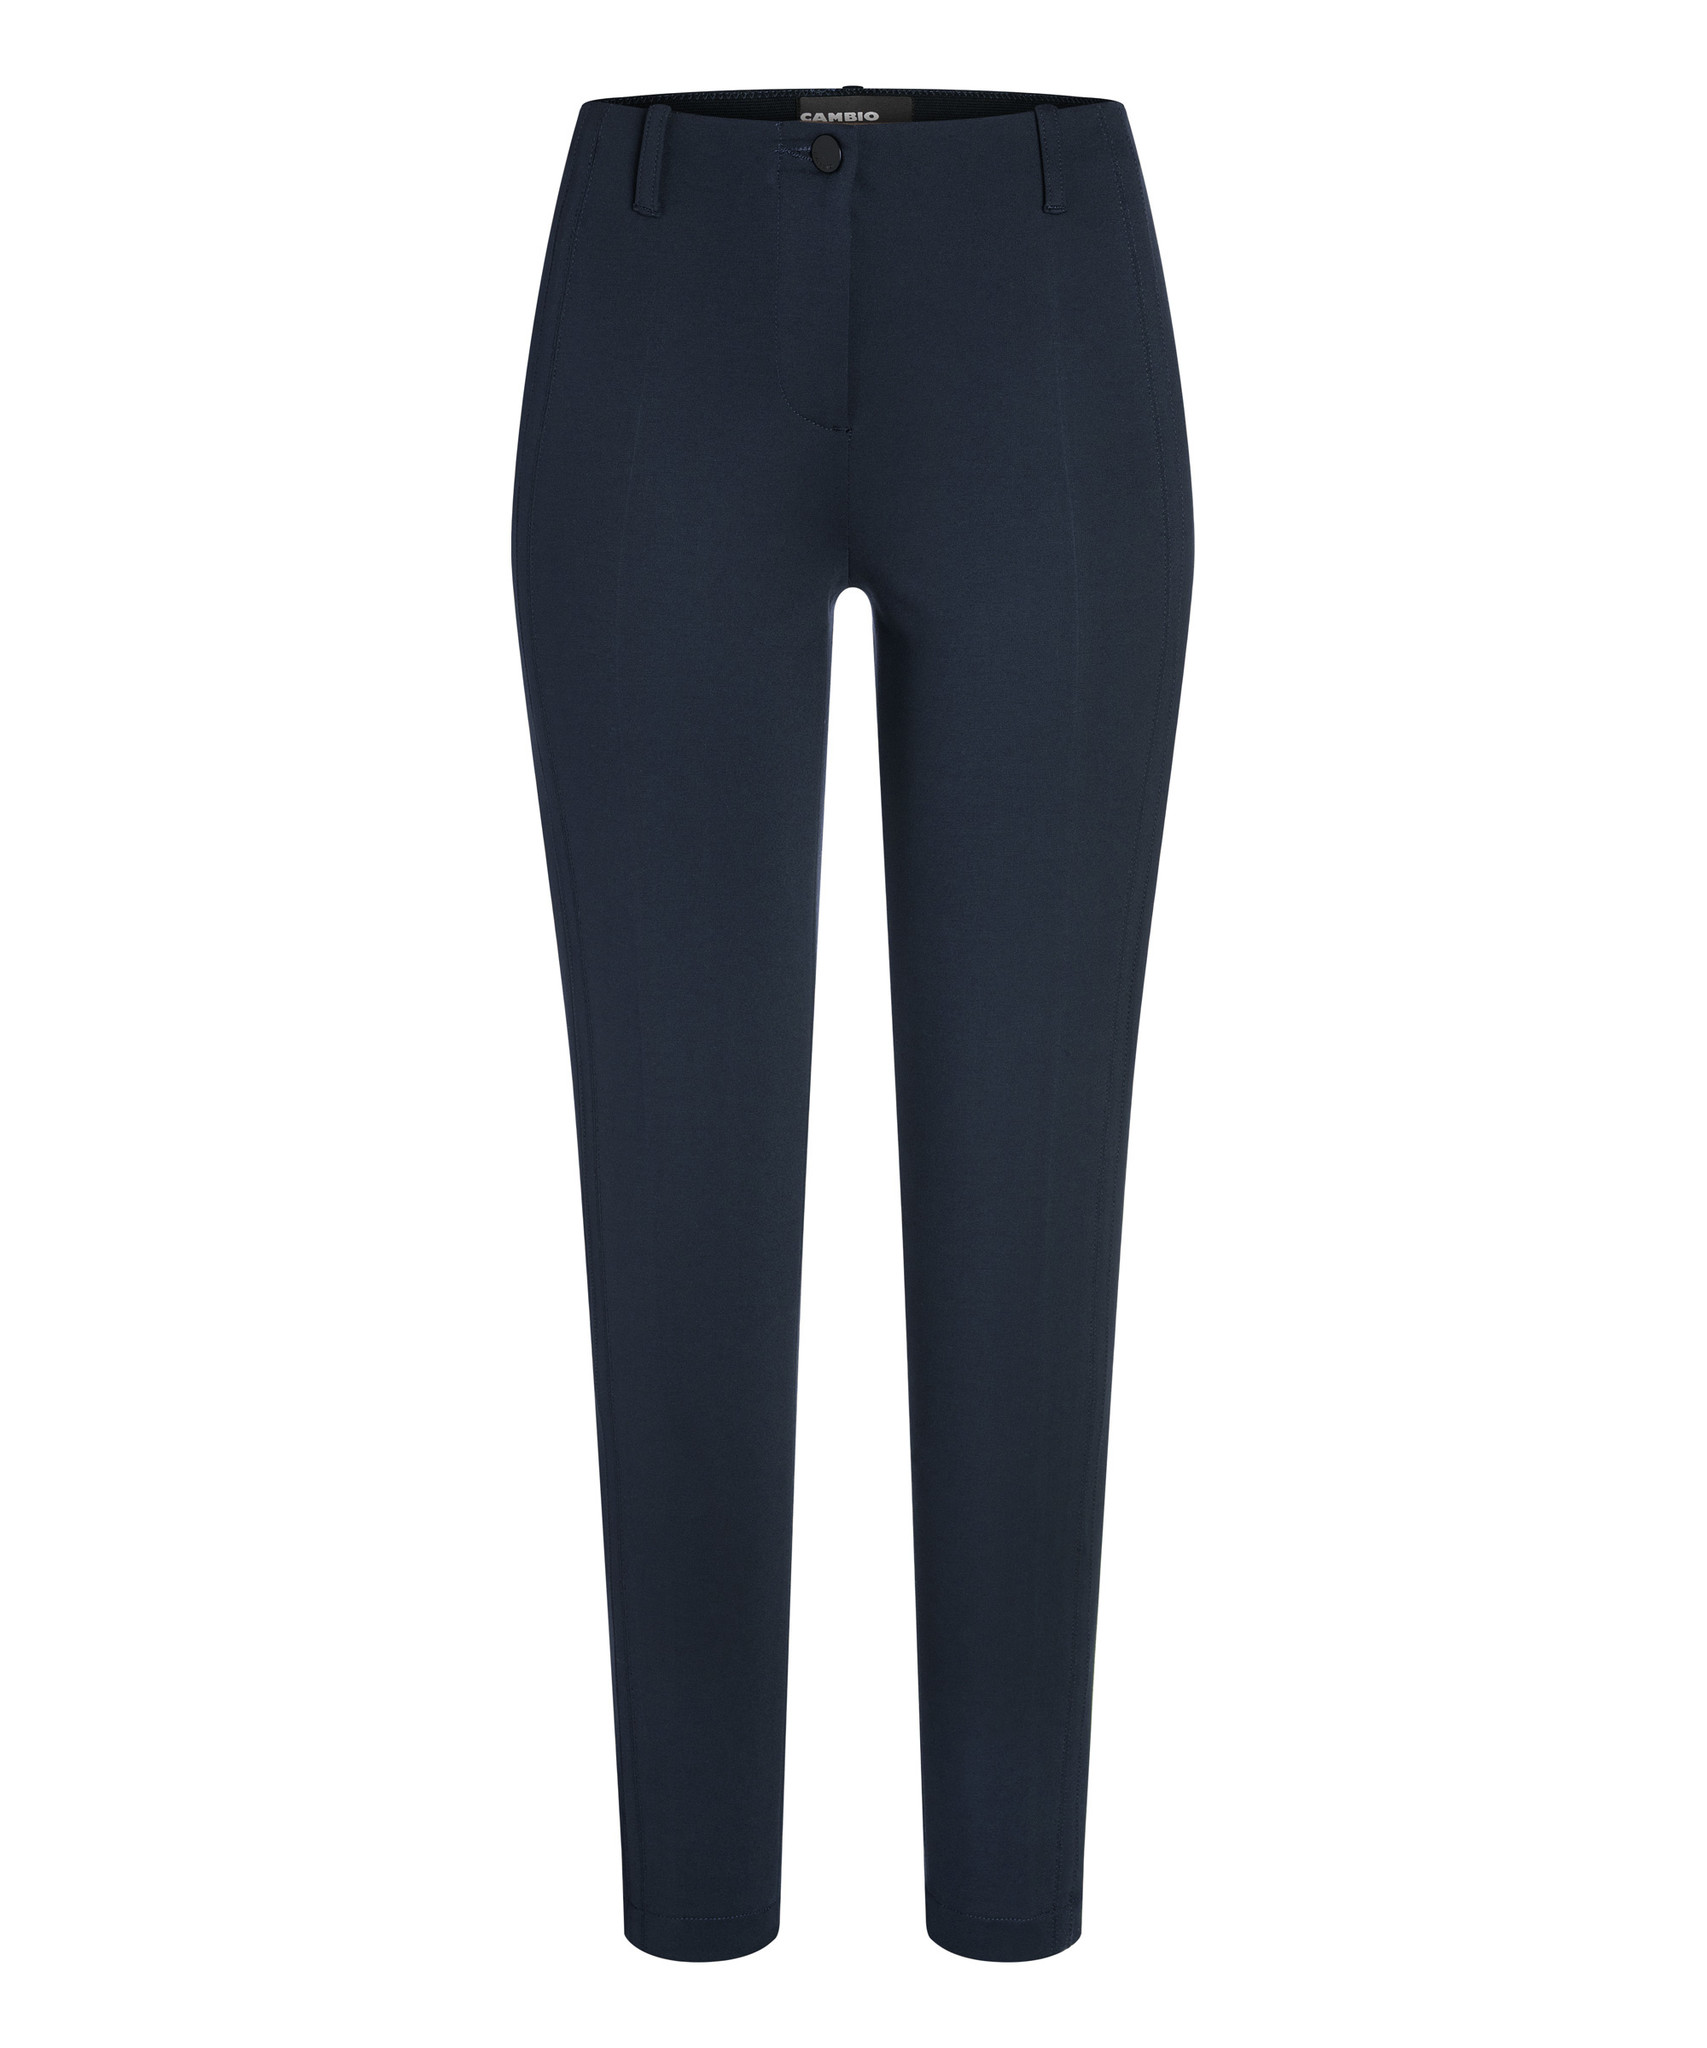 Cambio trousers ROS SEAM 6332-1